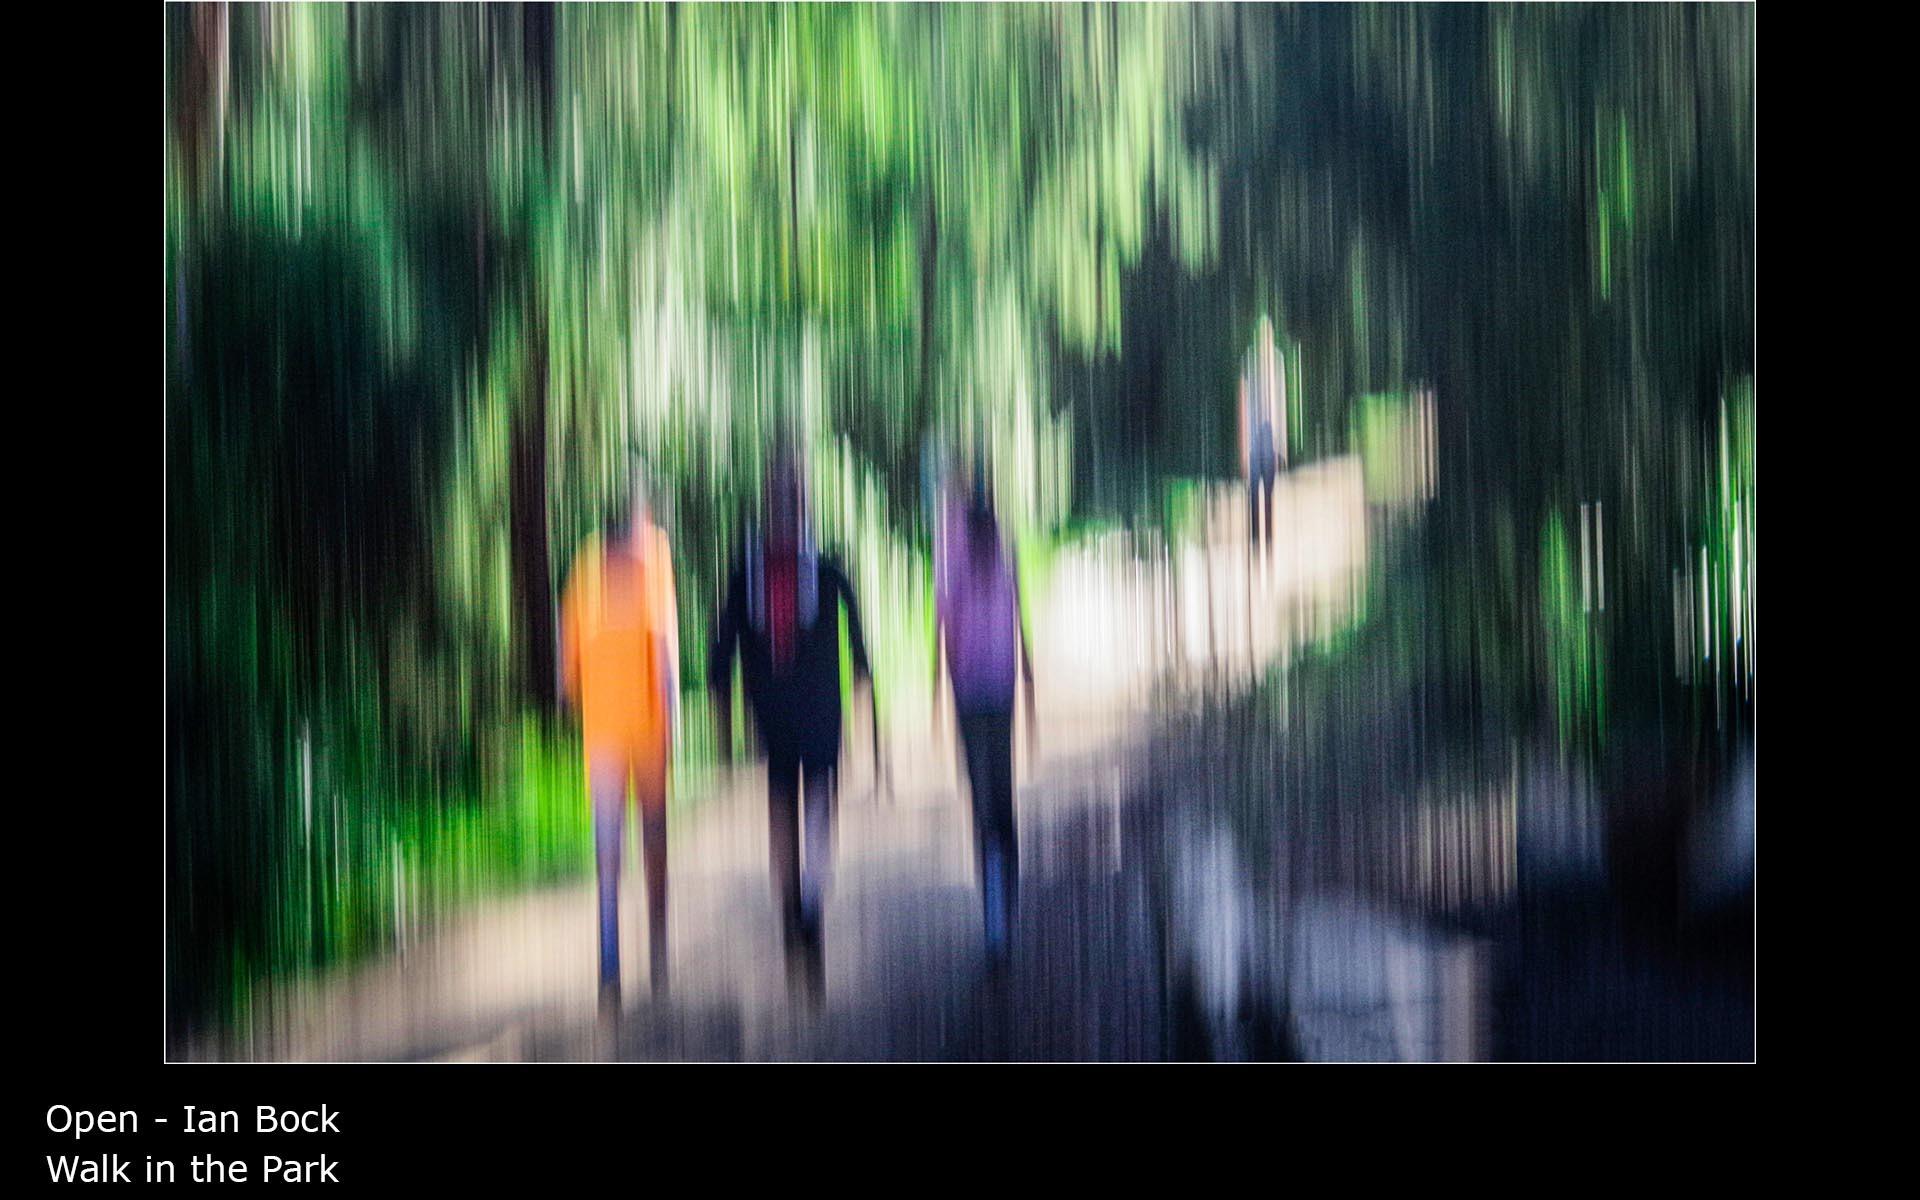 Walk in the Park - Ian Bock